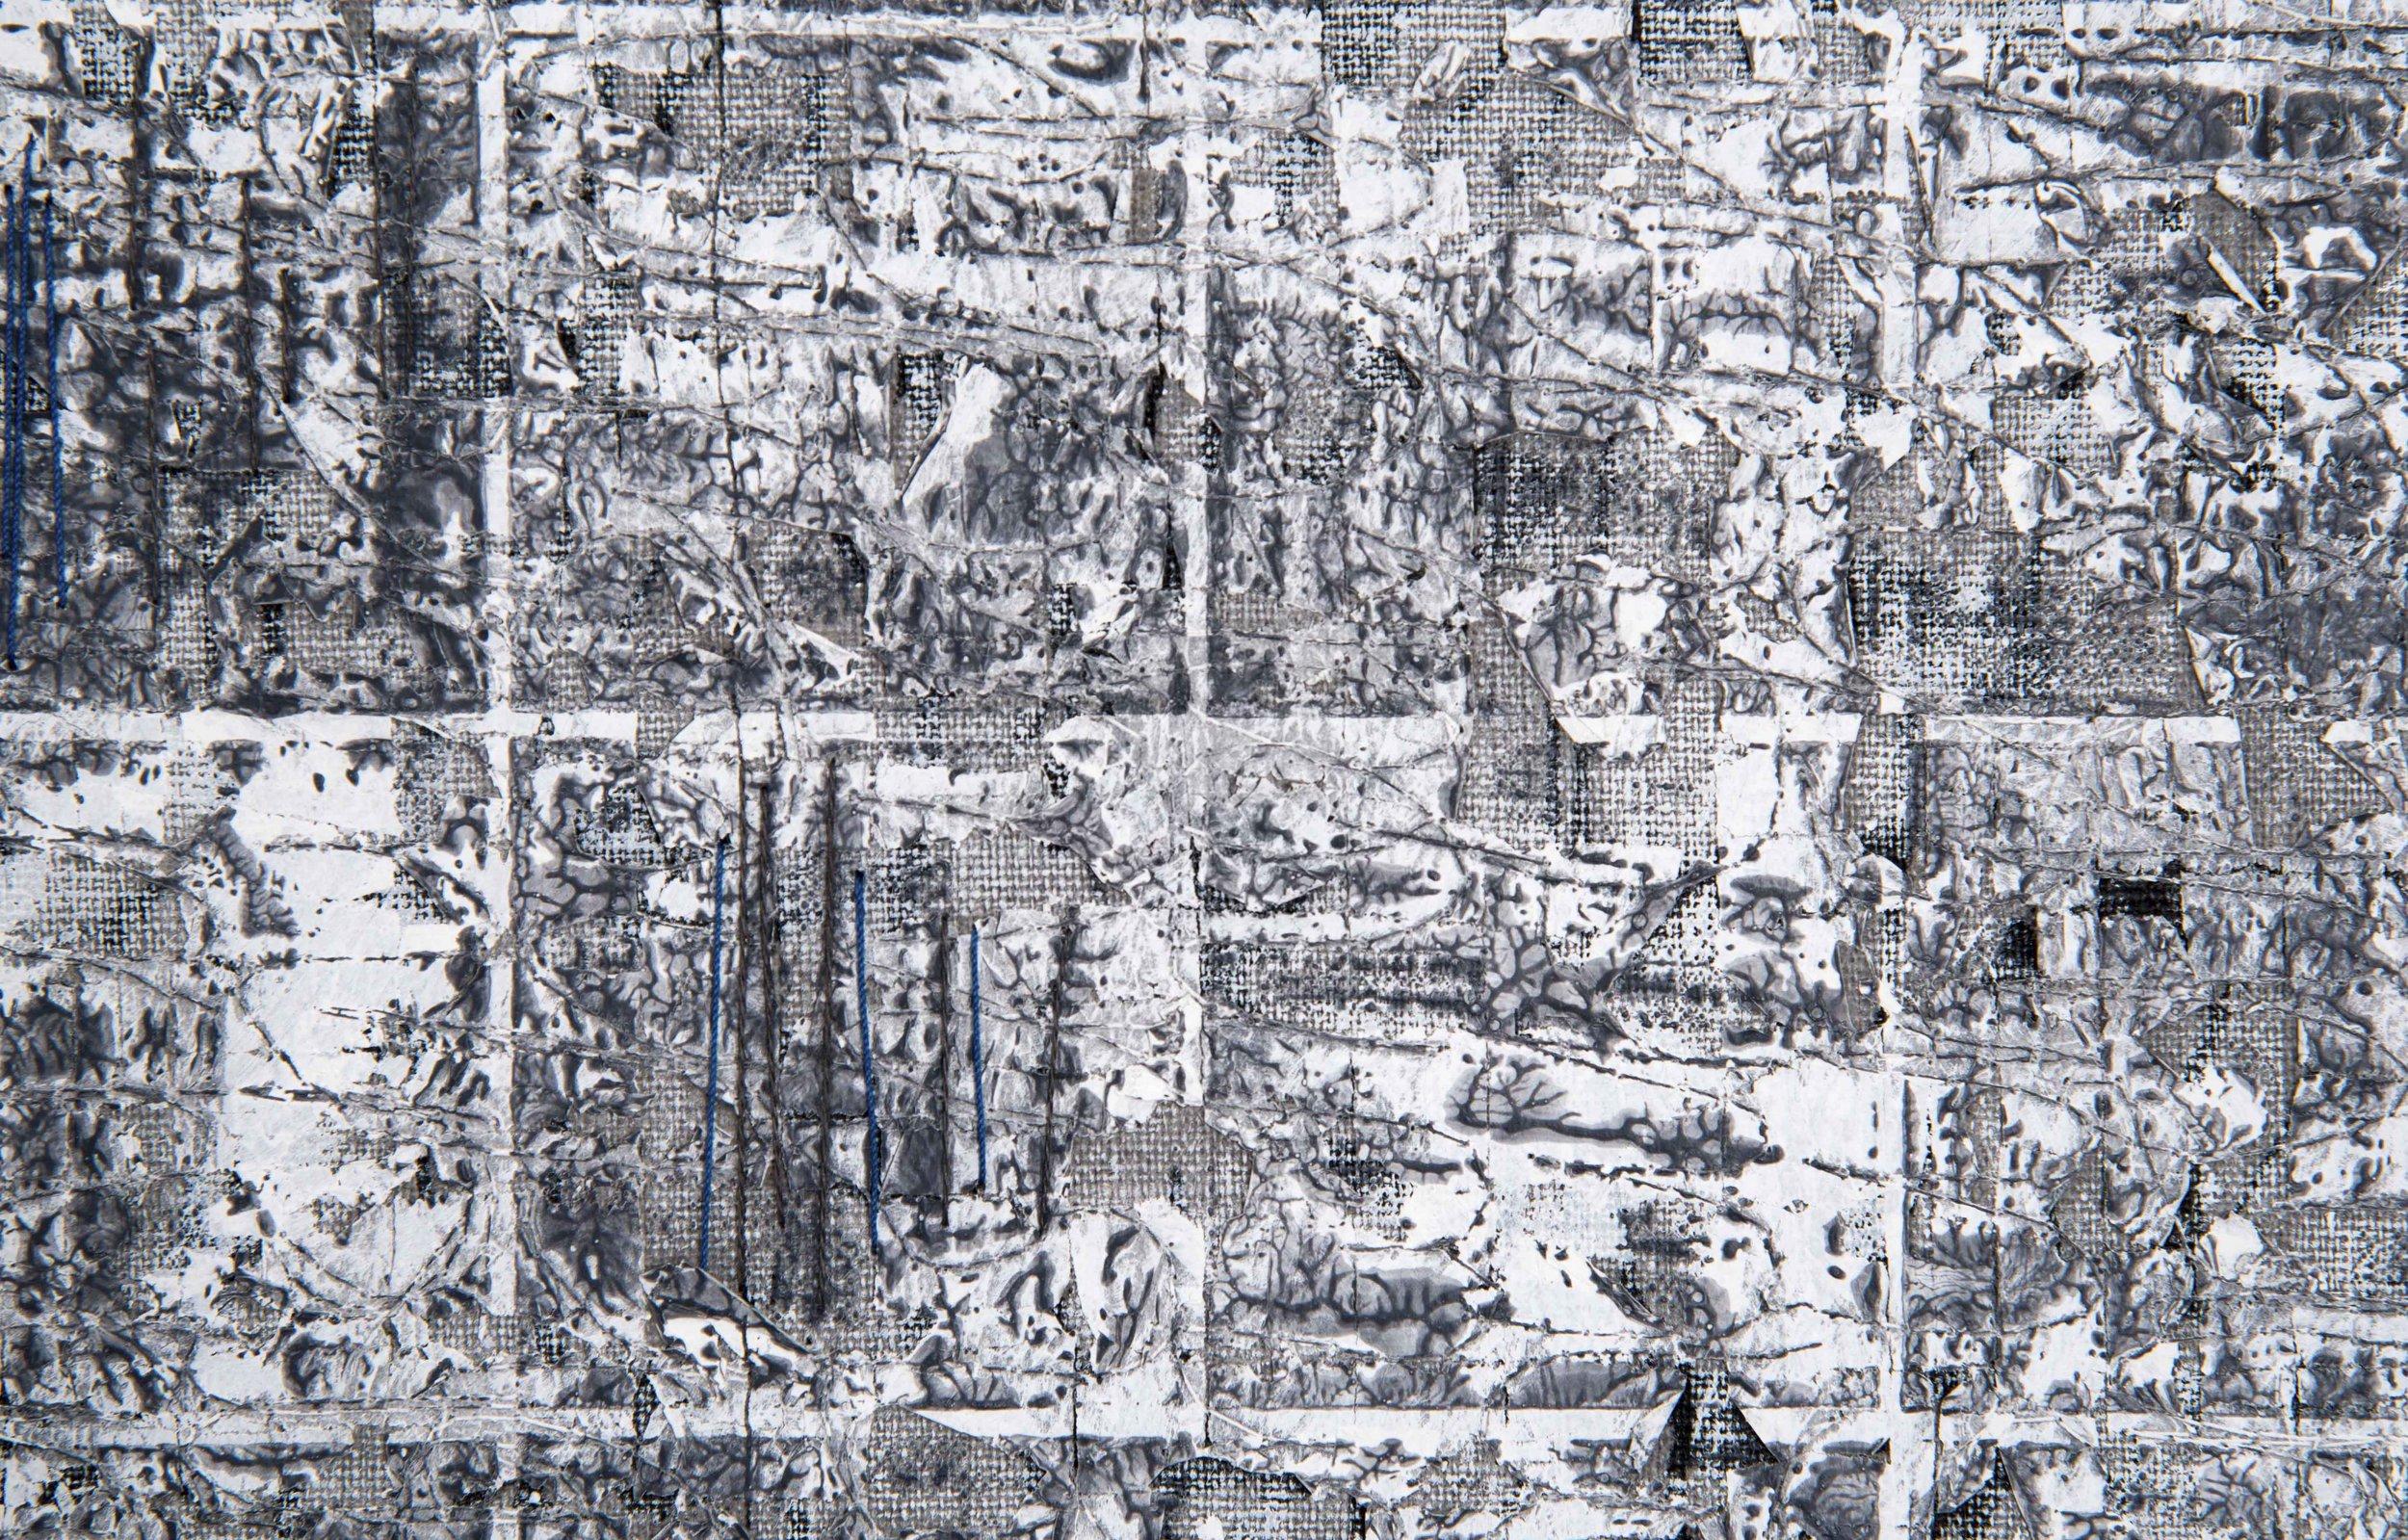 'Barren Arctic', detail. Linen, thread, tissue paper, acrylic paint, hand stitch